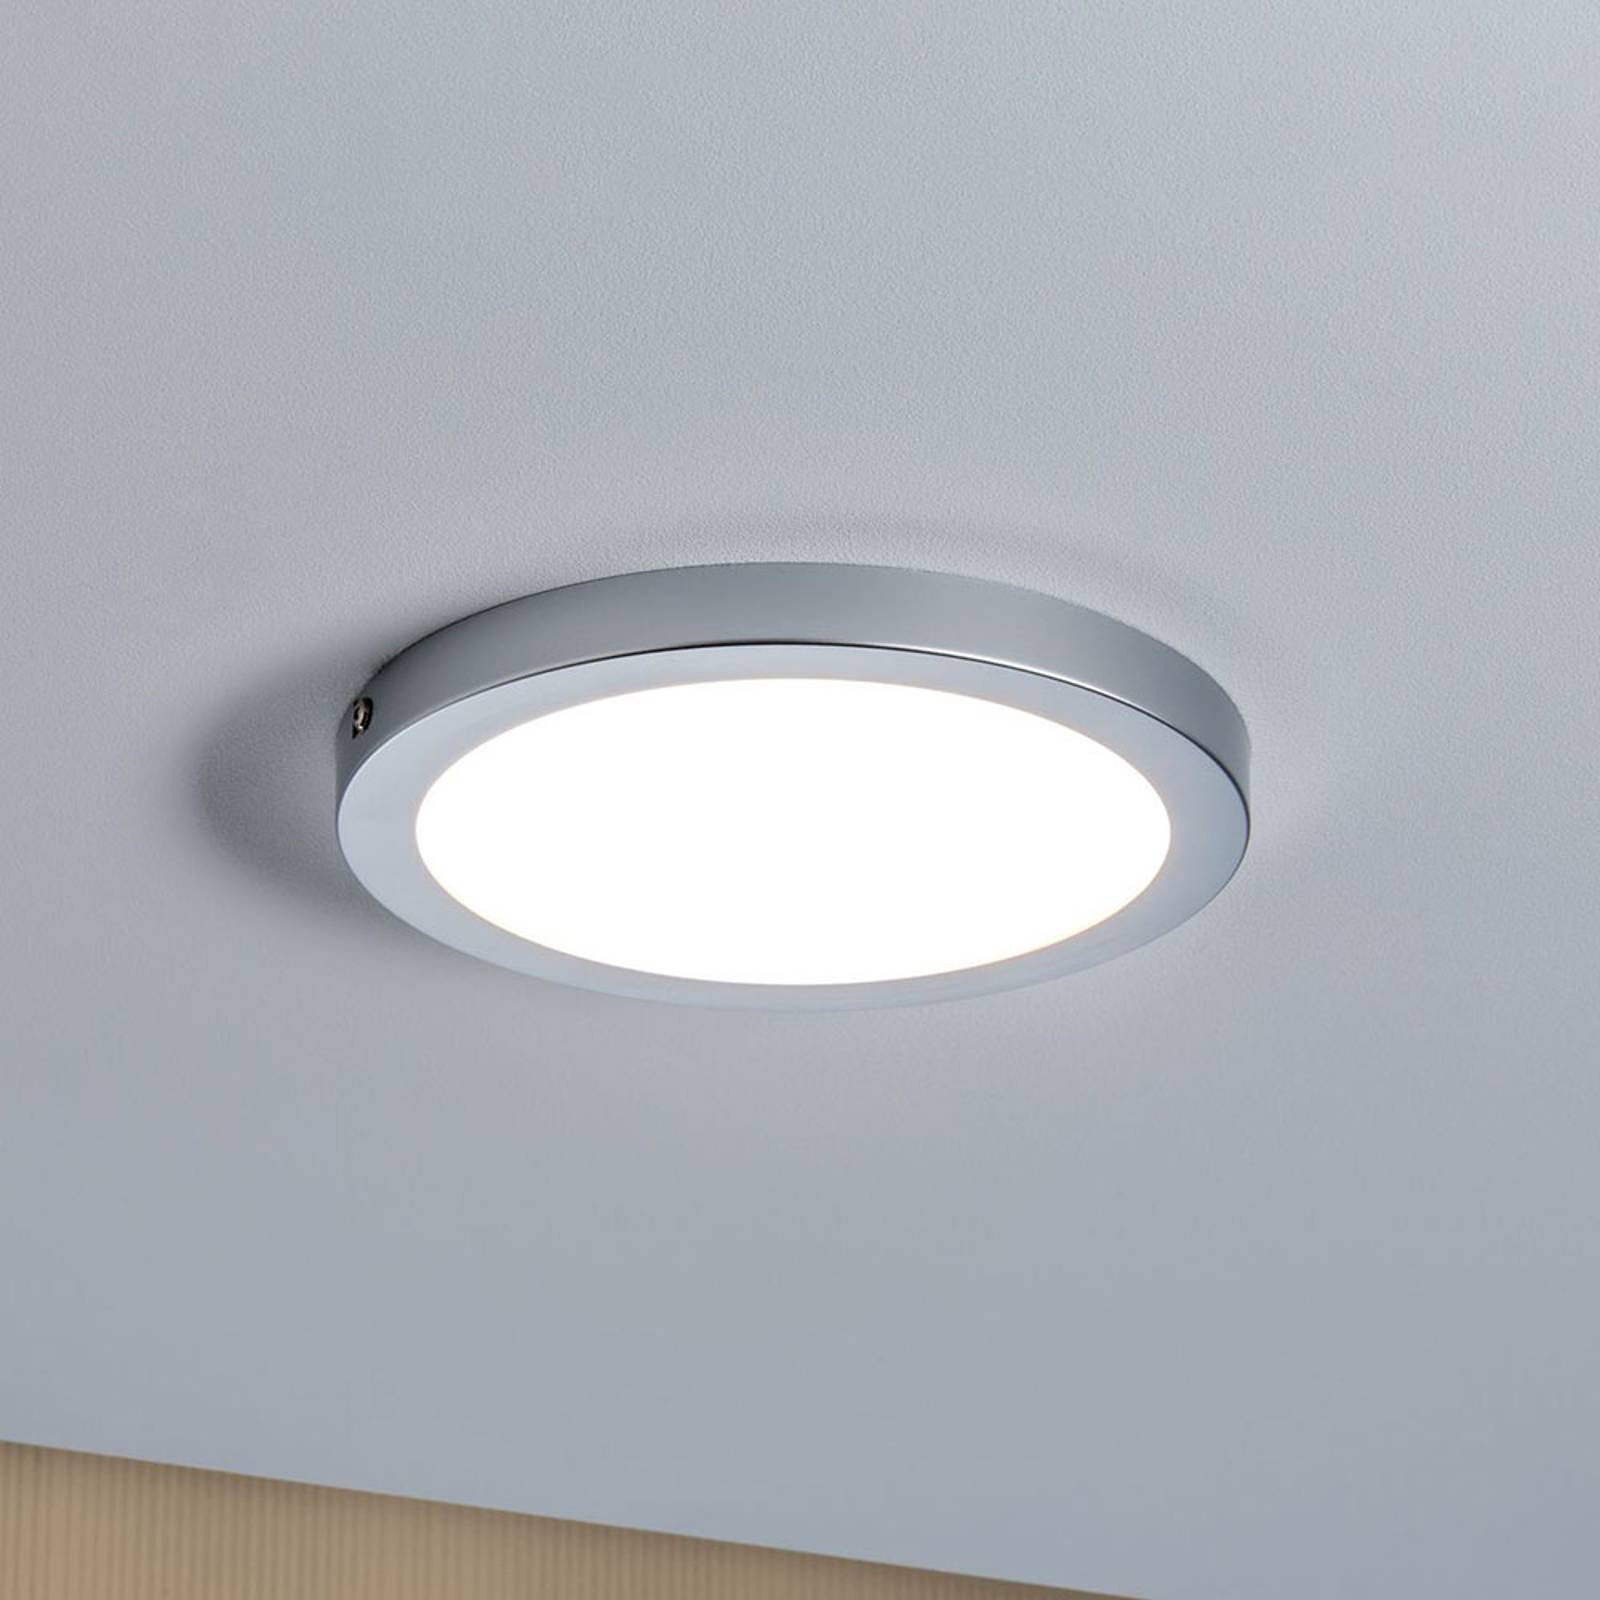 Paulmann Atria -LED-kattovalaisin Ø 22cm kromi